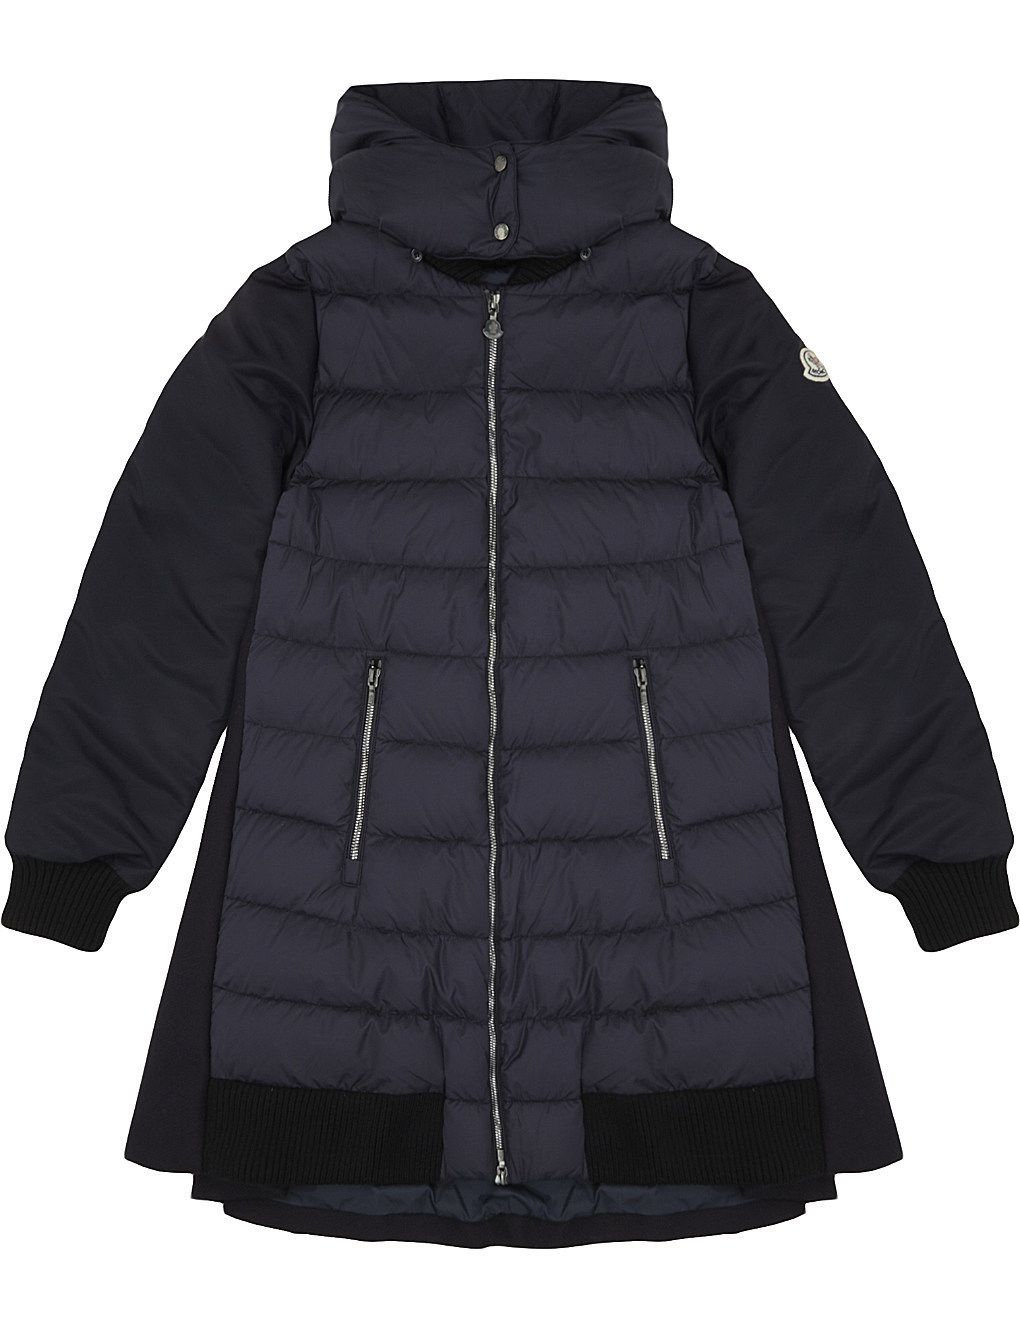 807b3f7aa MONCLER More Coats MONCLER More Coats BLOIS 2017 SS 2